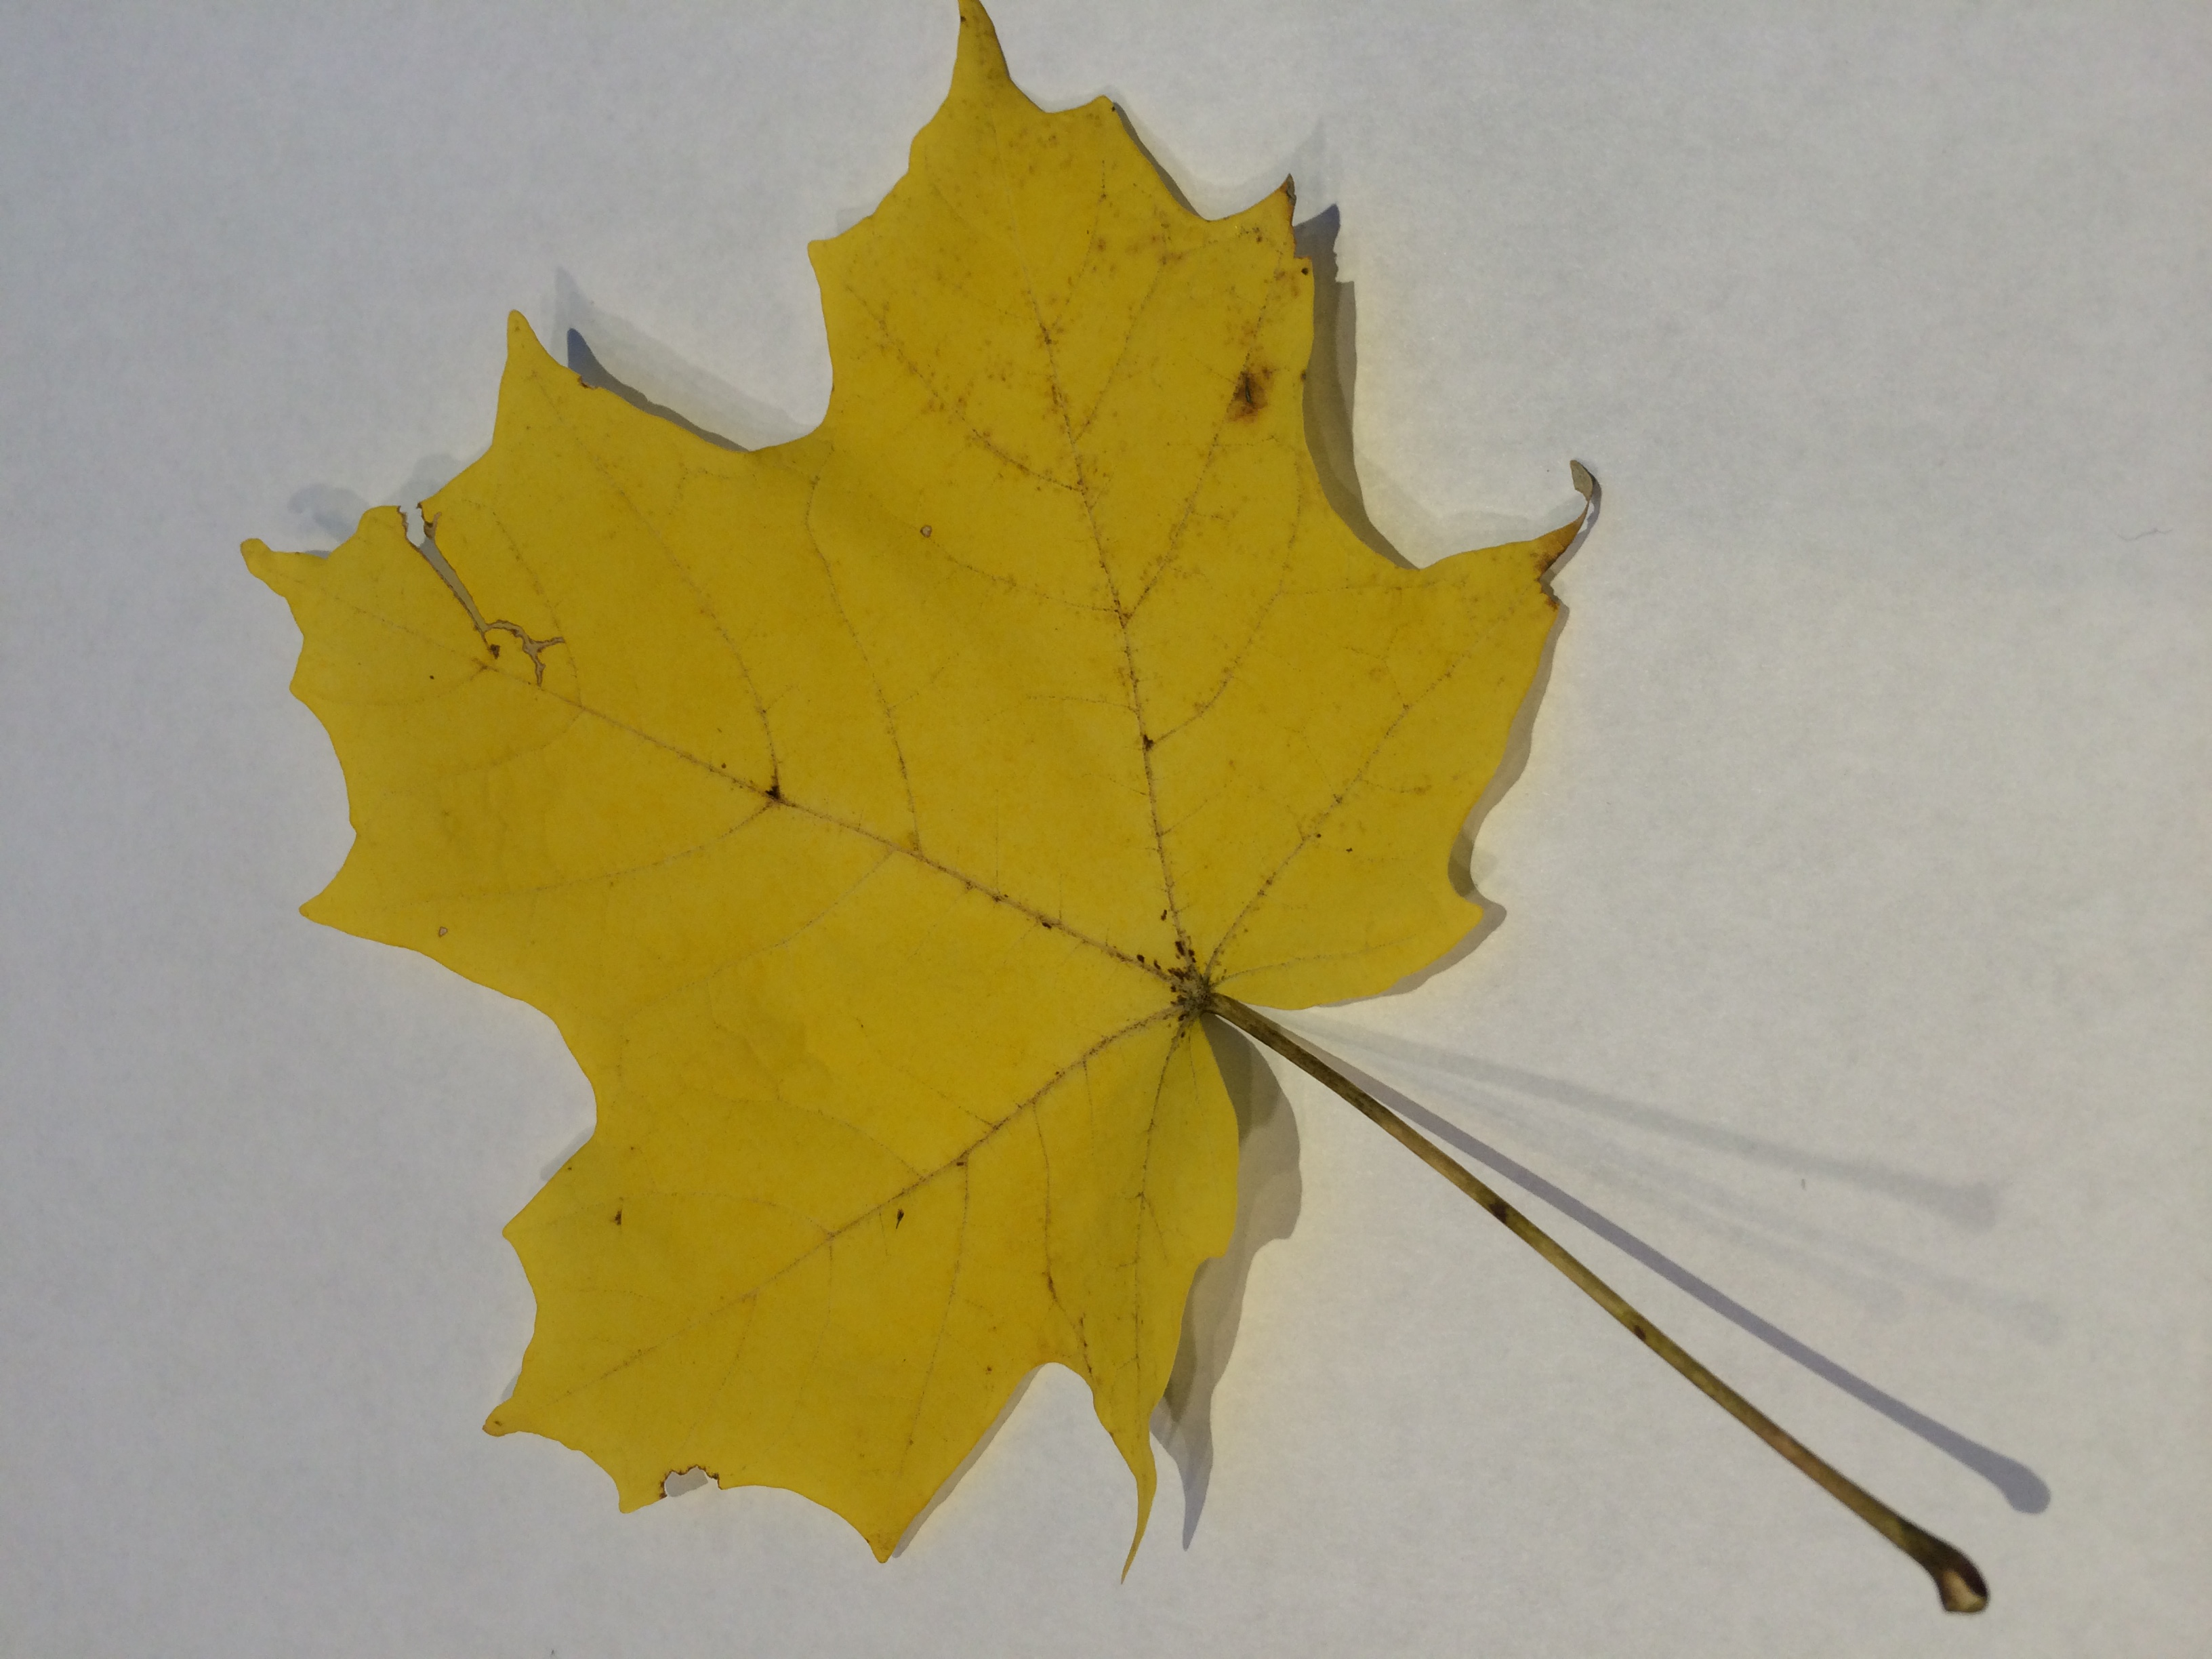 gwl/static/gwl/images/new-leaves/yellow-1.jpg